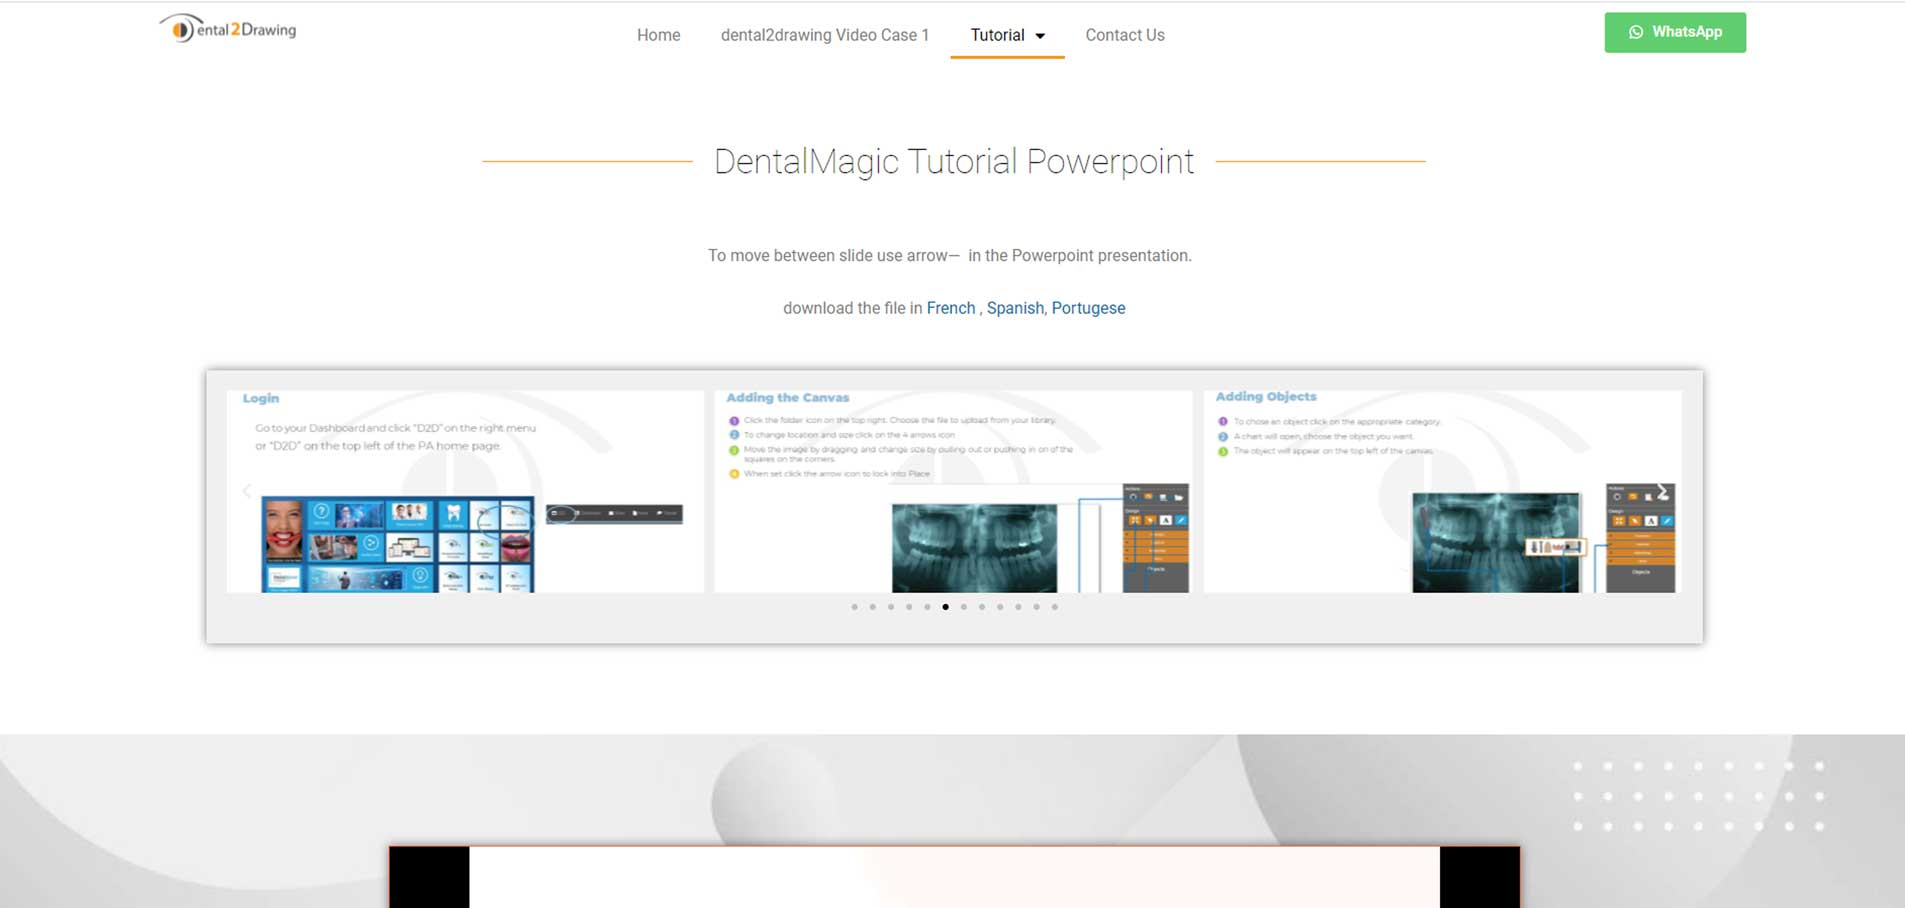 Dental2Drawing website